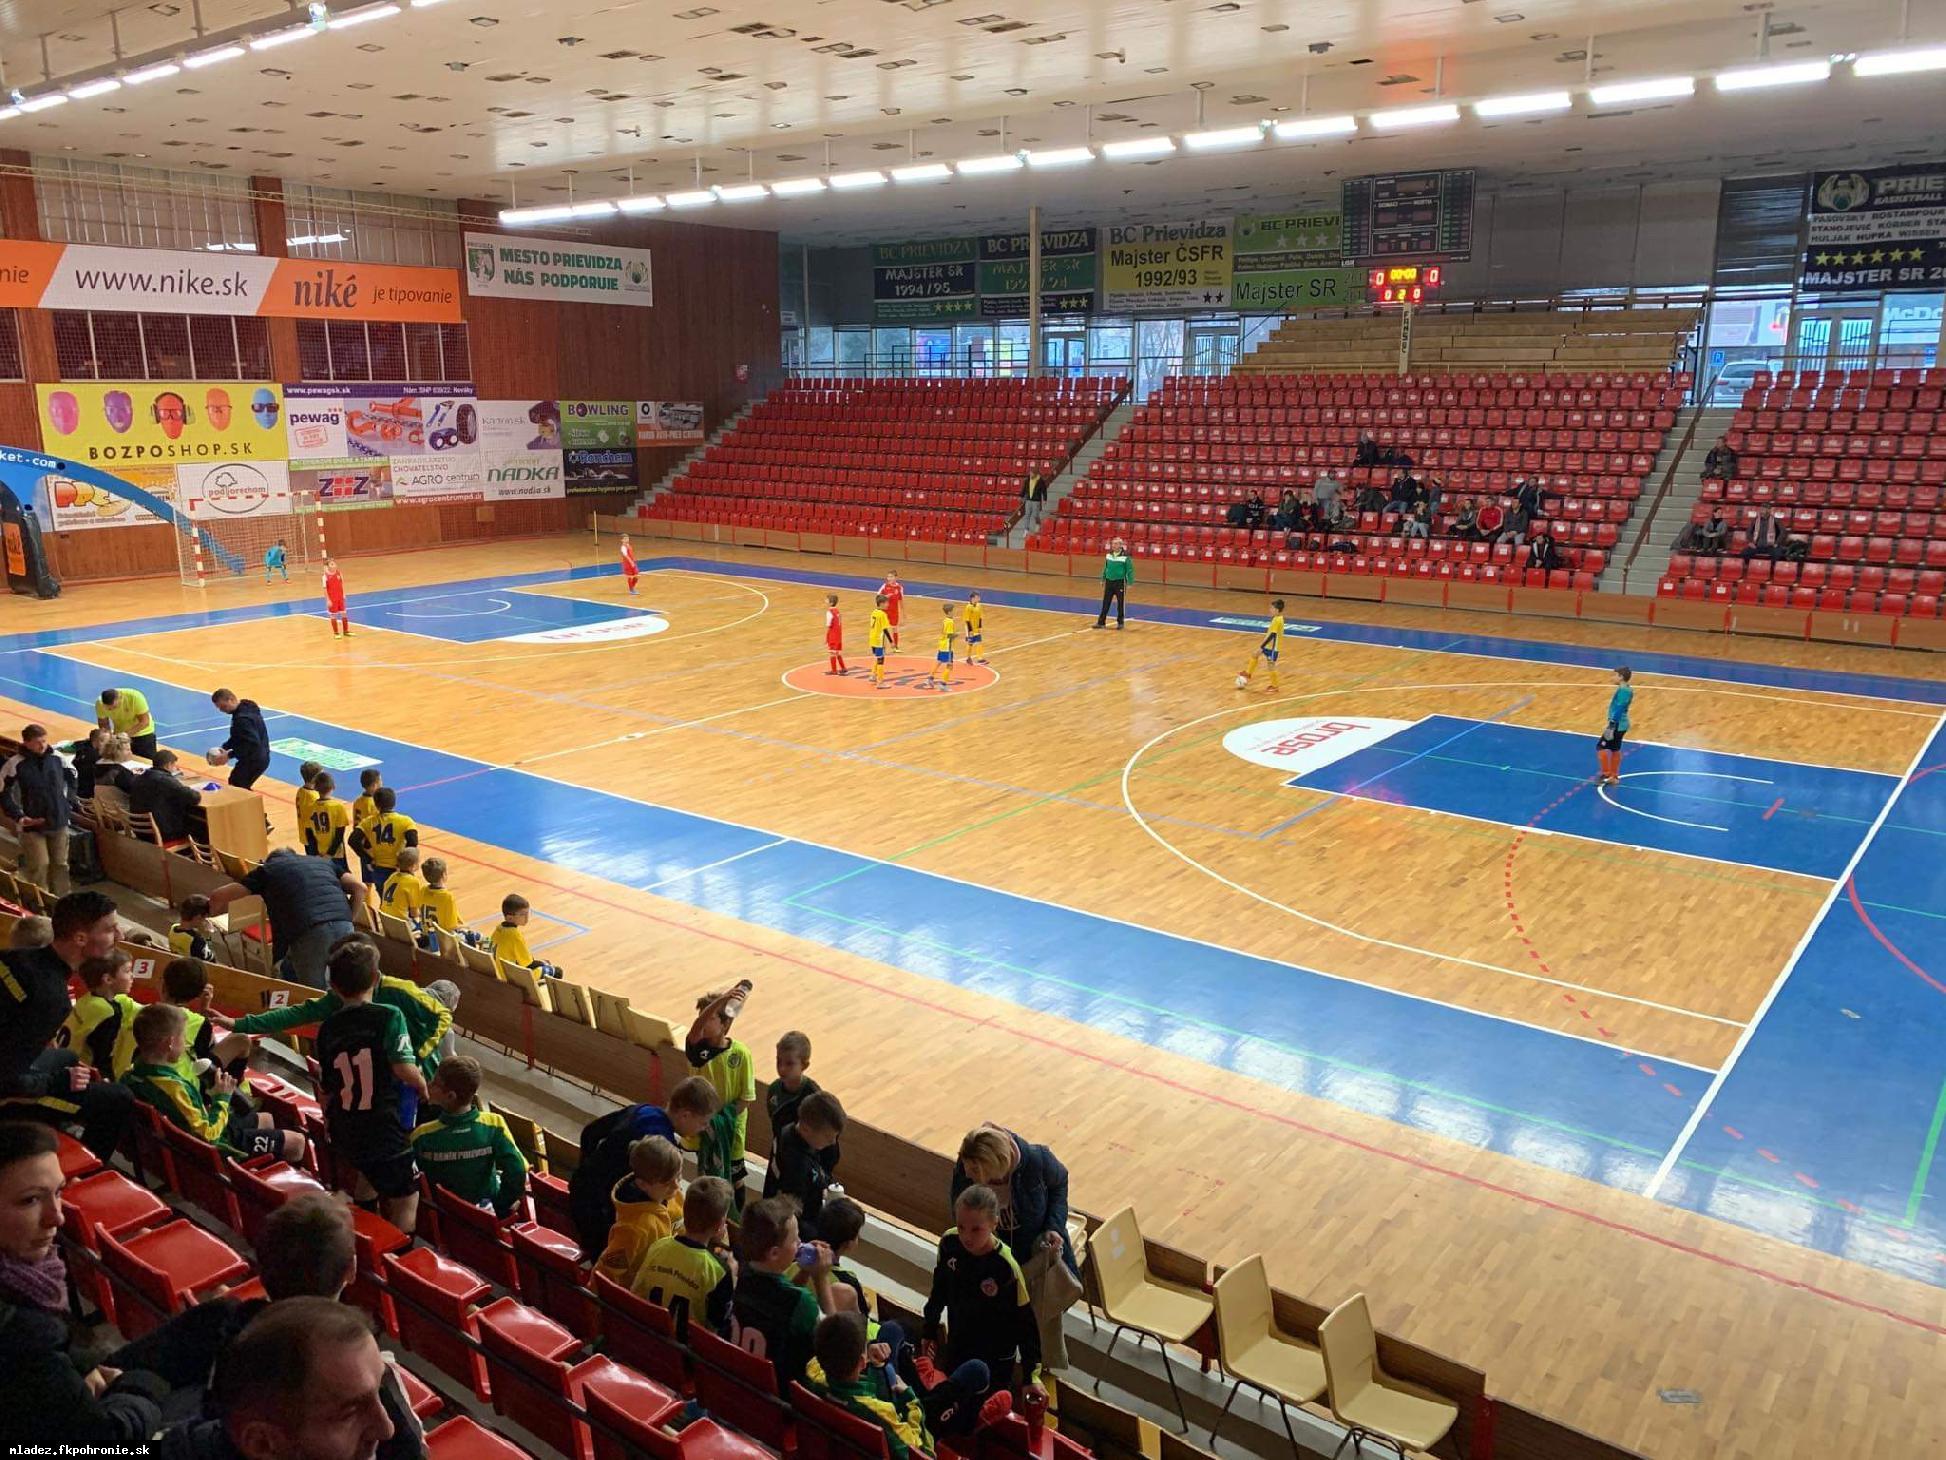 obr: U10: Na halovom turnaji v Prievidzi